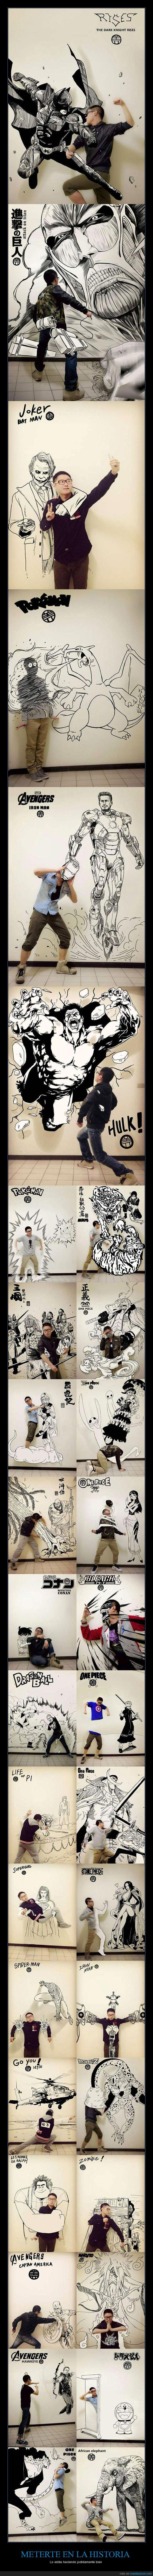 anime,dibujos,ilustraciones,japonés,manga,pared